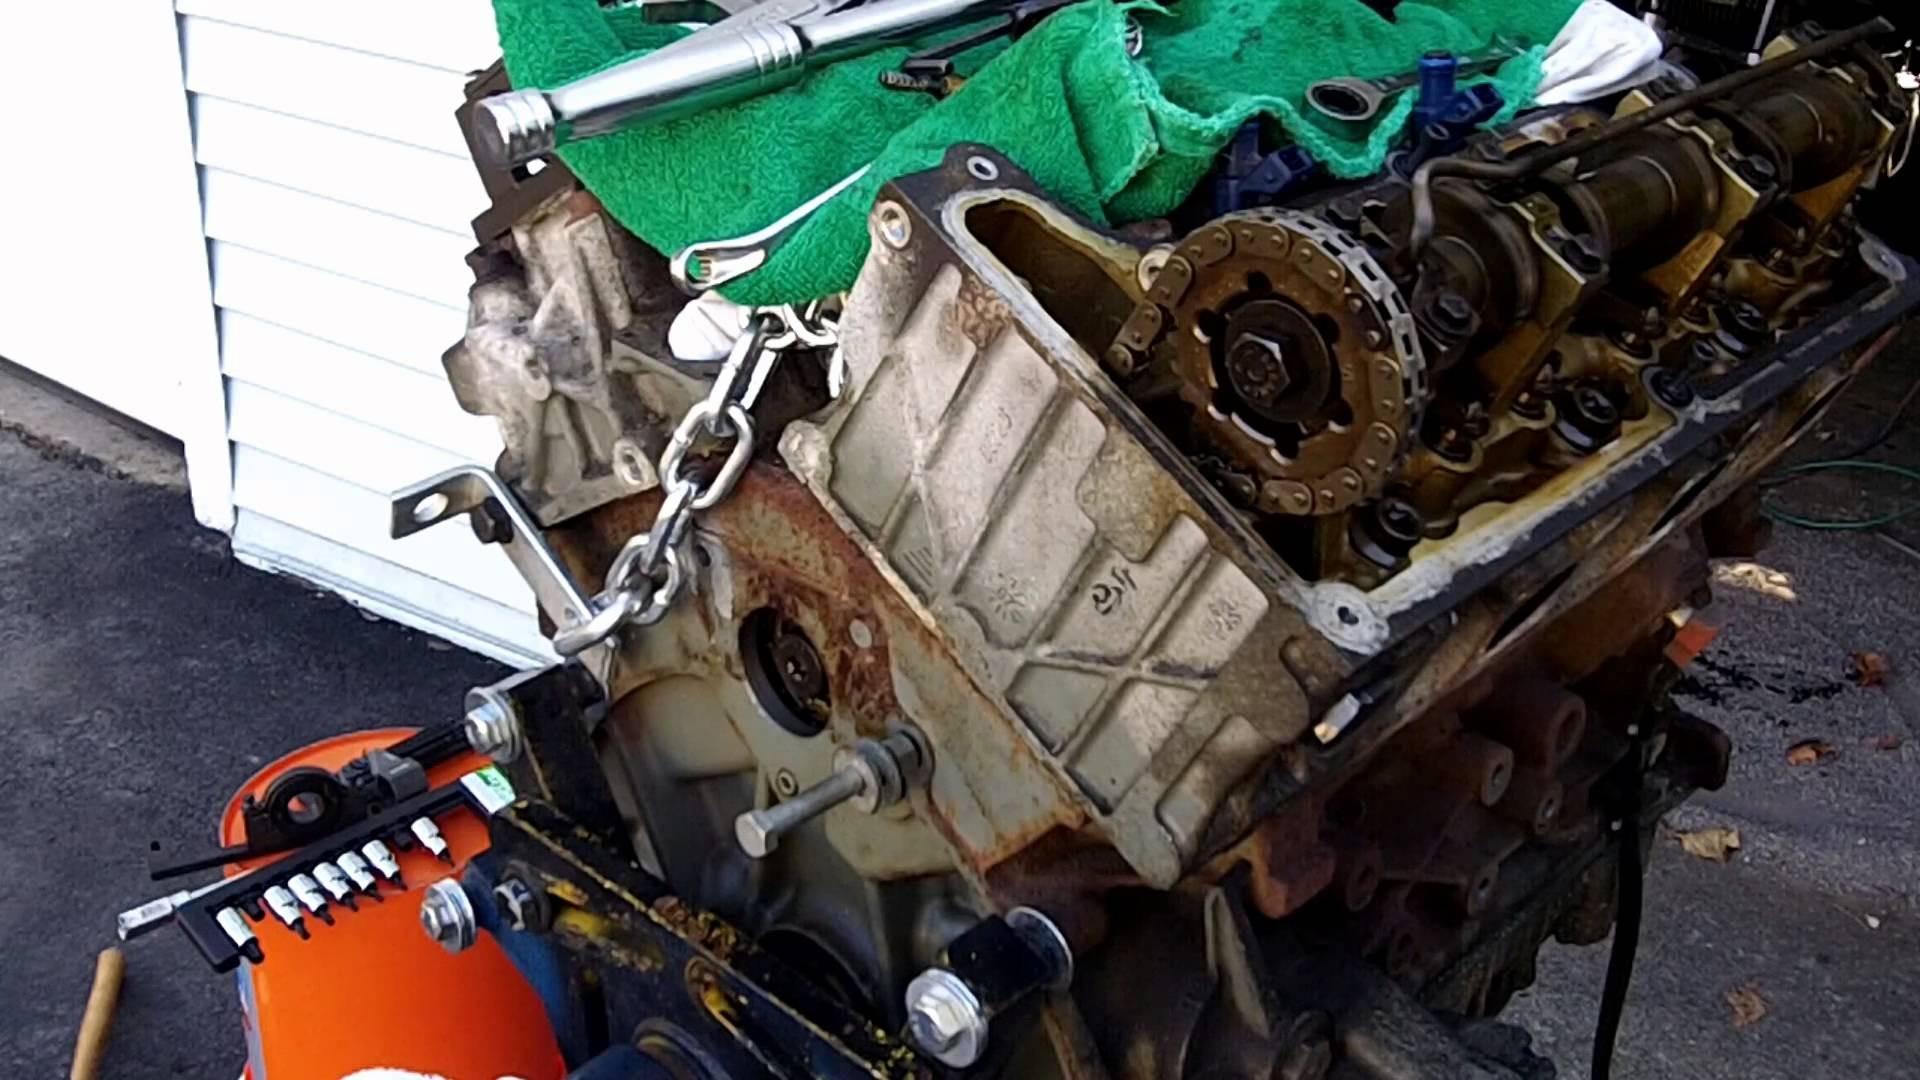 97 Ford Ranger Timing Belt 98 4 0 Engine Diagram 1999 Explorer Sohc 55 40 Chain Rh Detoxicrecenze Com